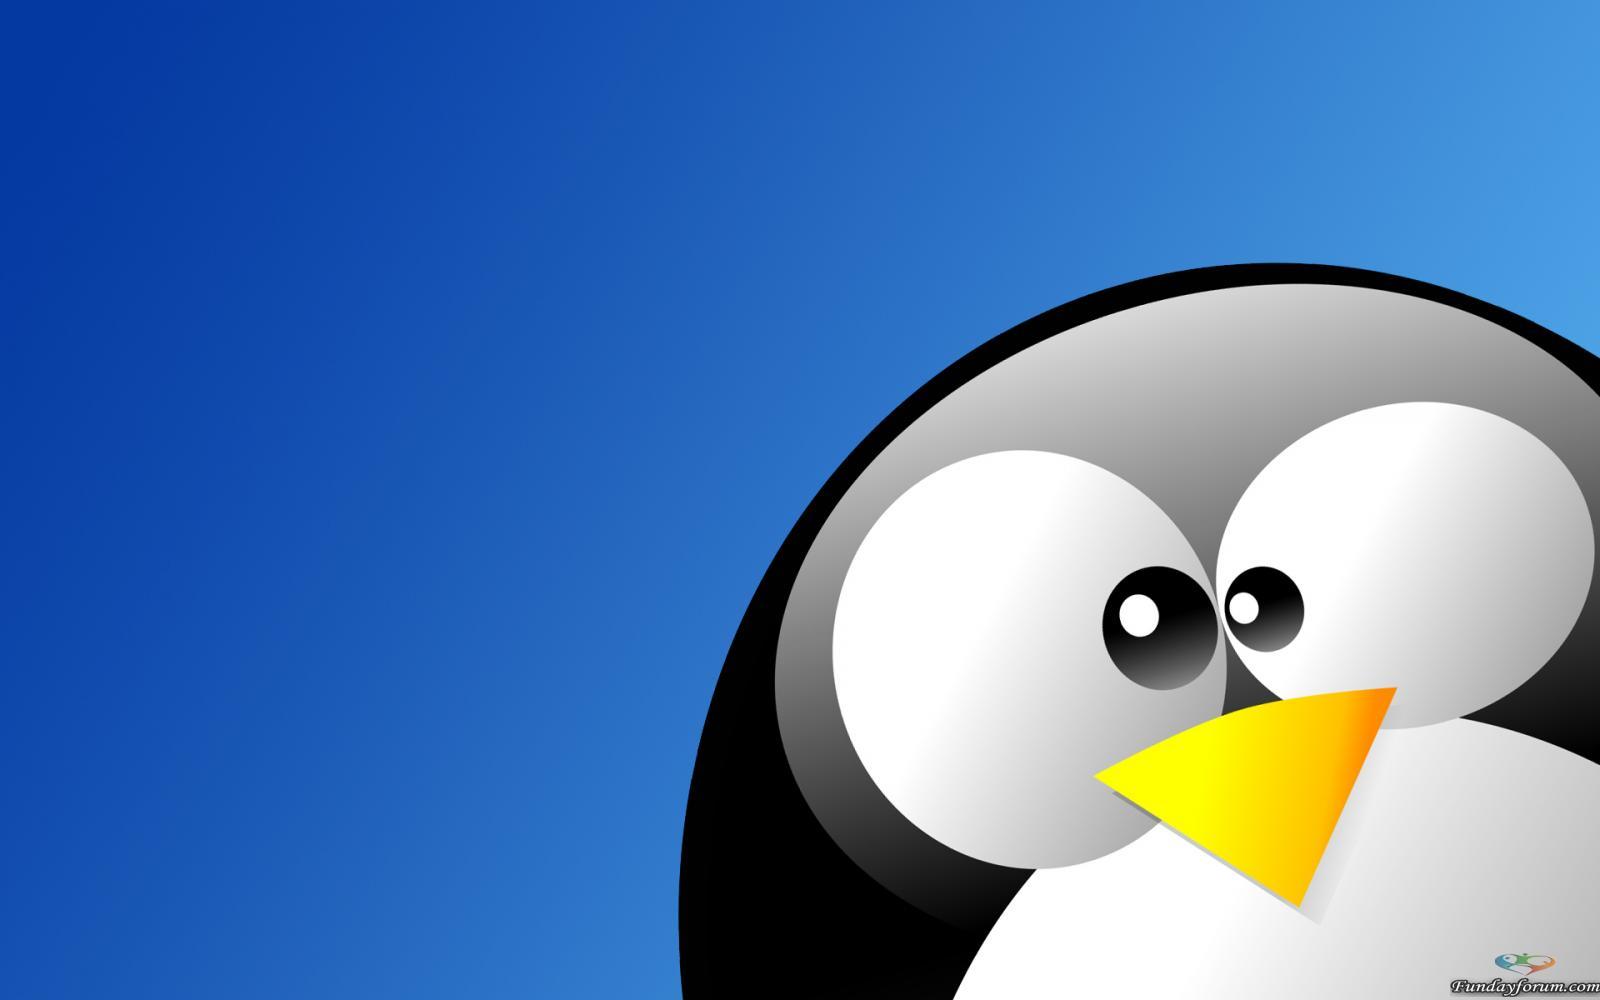 6882620-linux-wallpaper.jpg